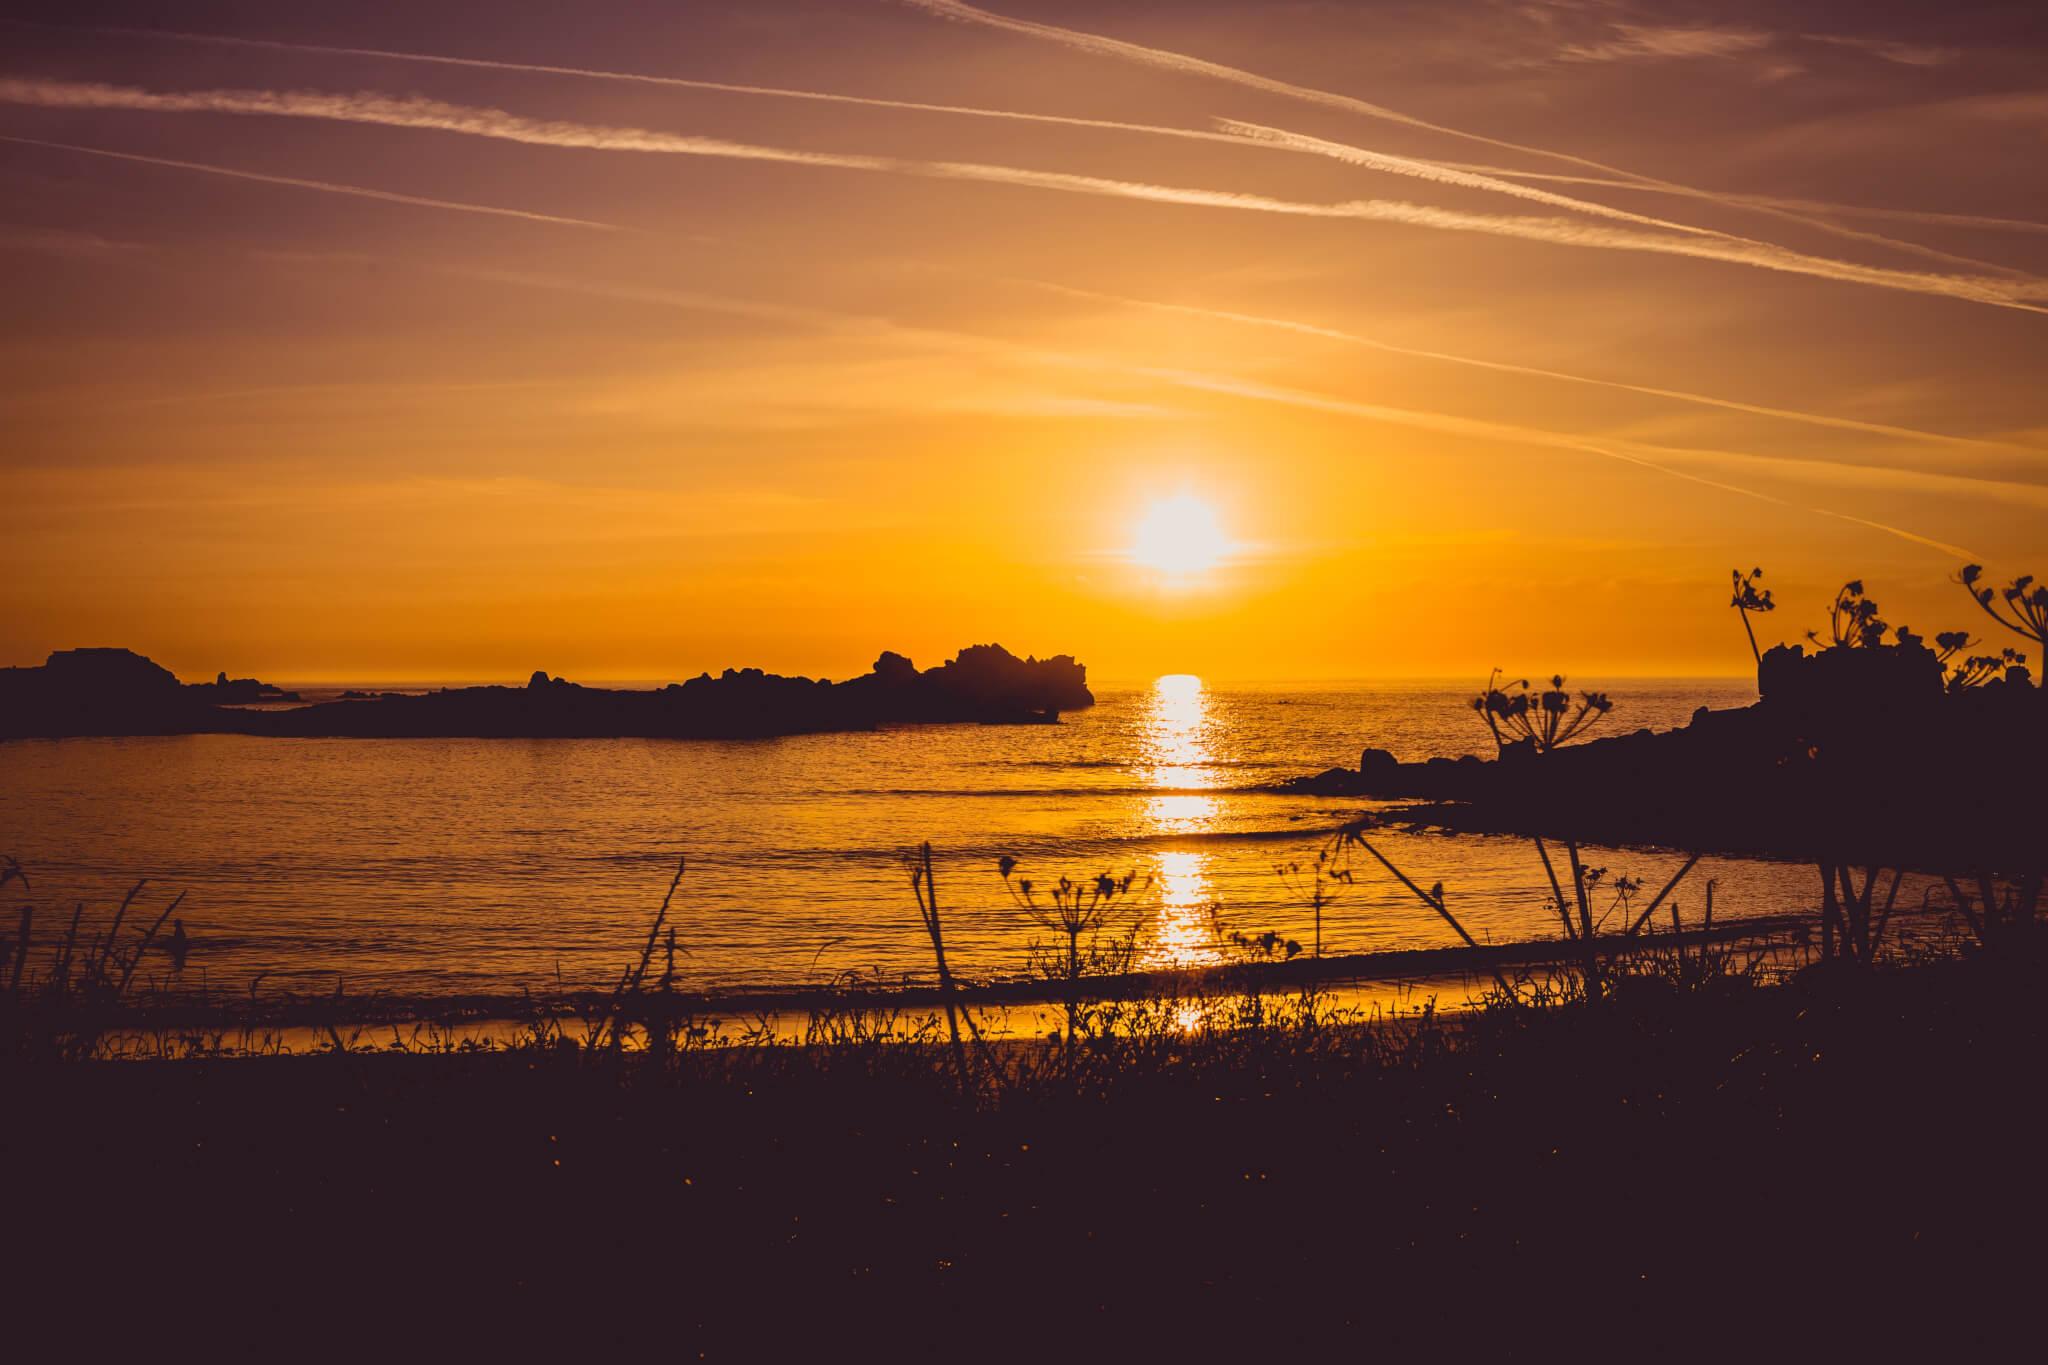 Sunset over seashore